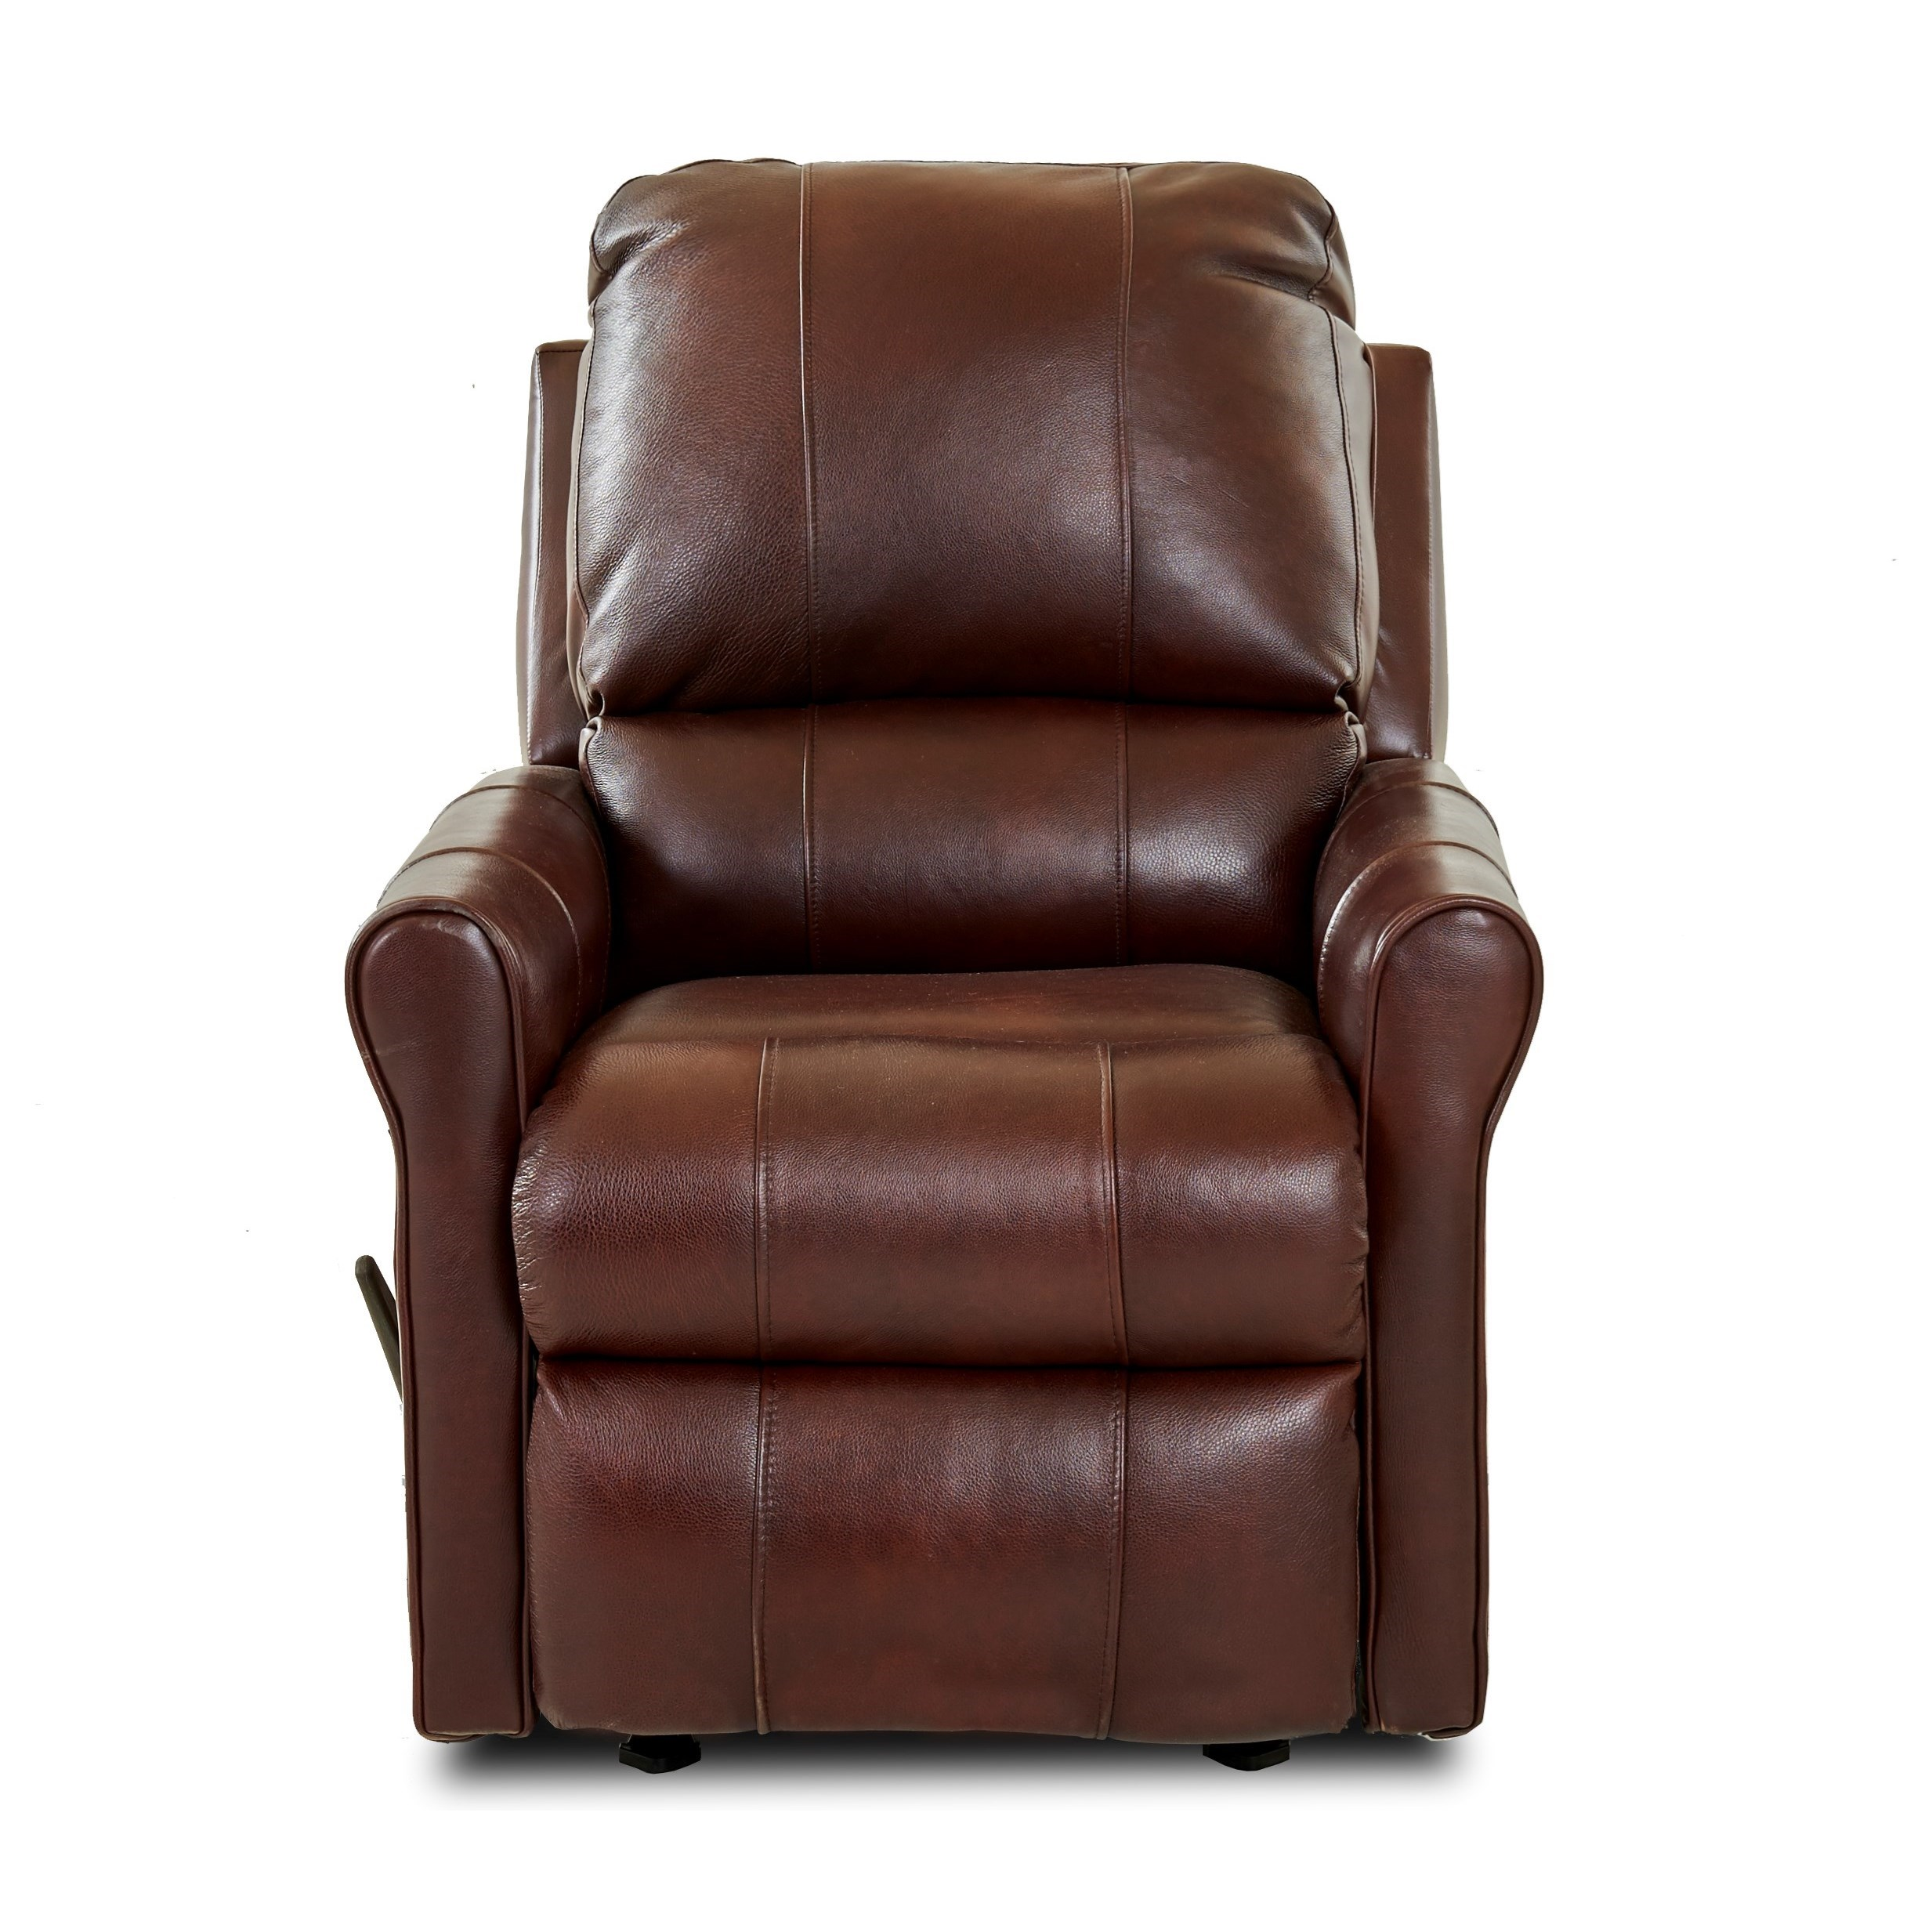 Baja Swivel Rocking Reclining Chair by Klaussner at Lapeer Furniture & Mattress Center